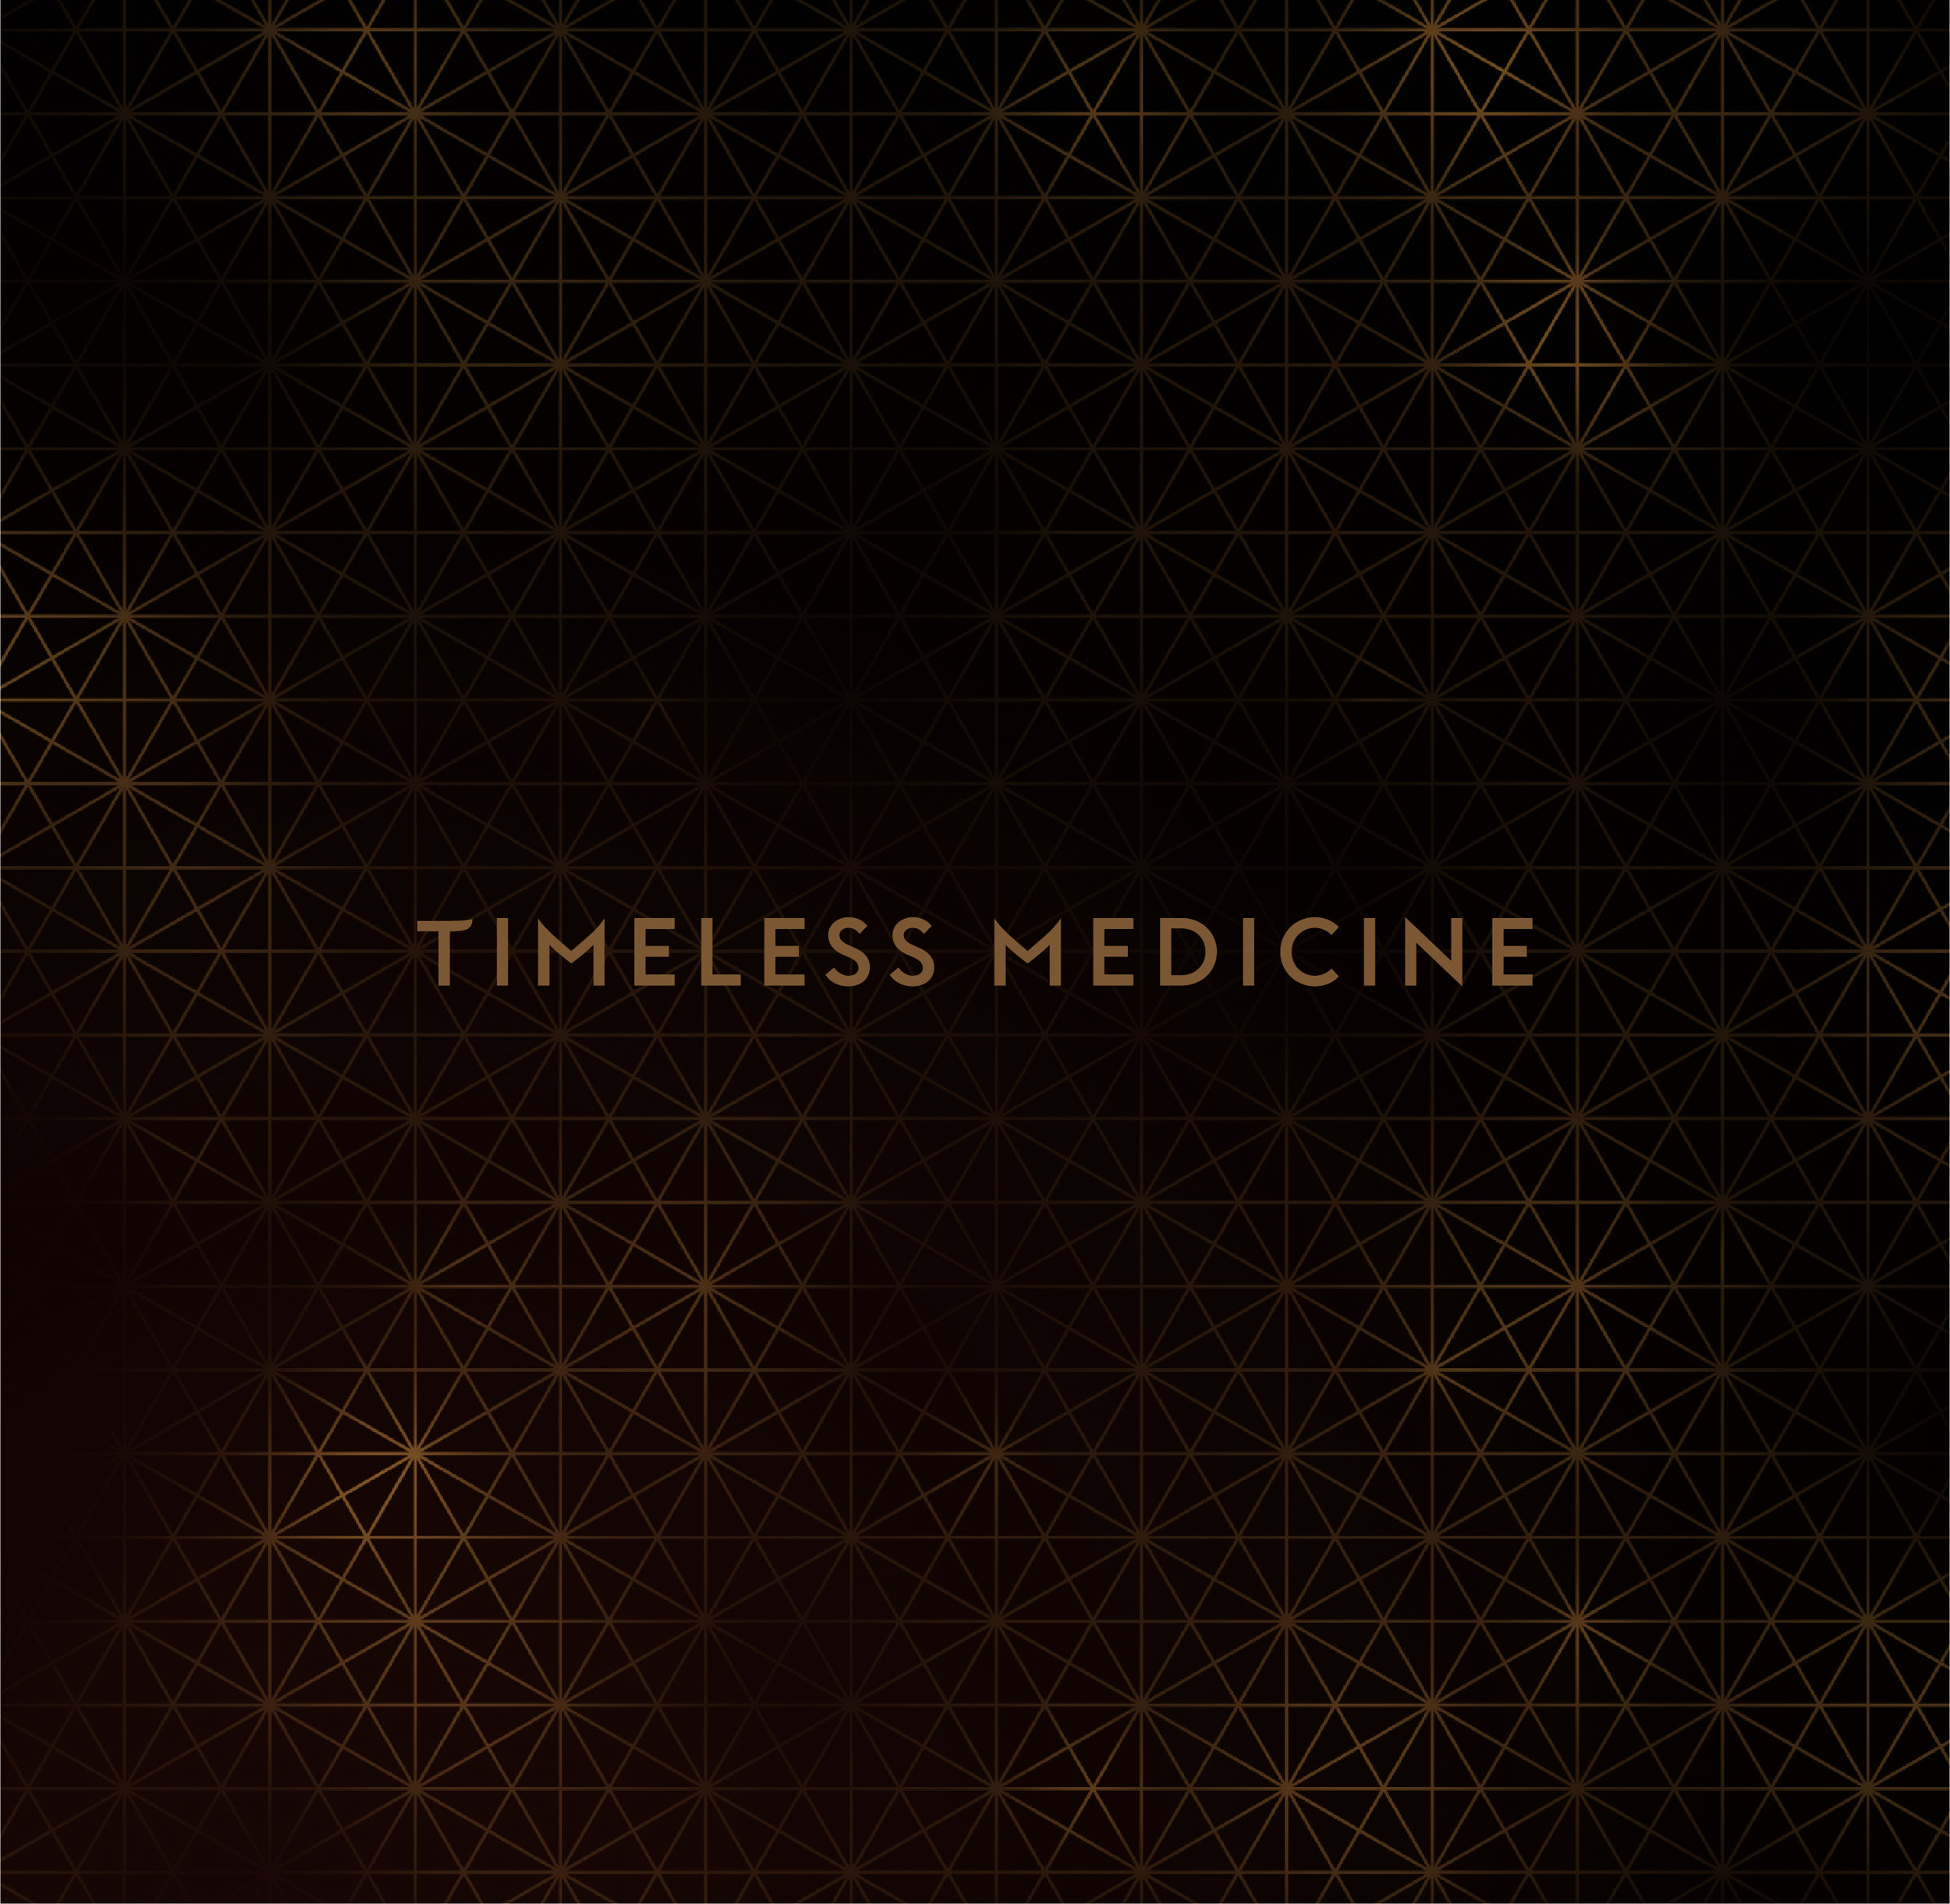 07_20181129_ Penny_Lorber_TimelessMedicine.jpg